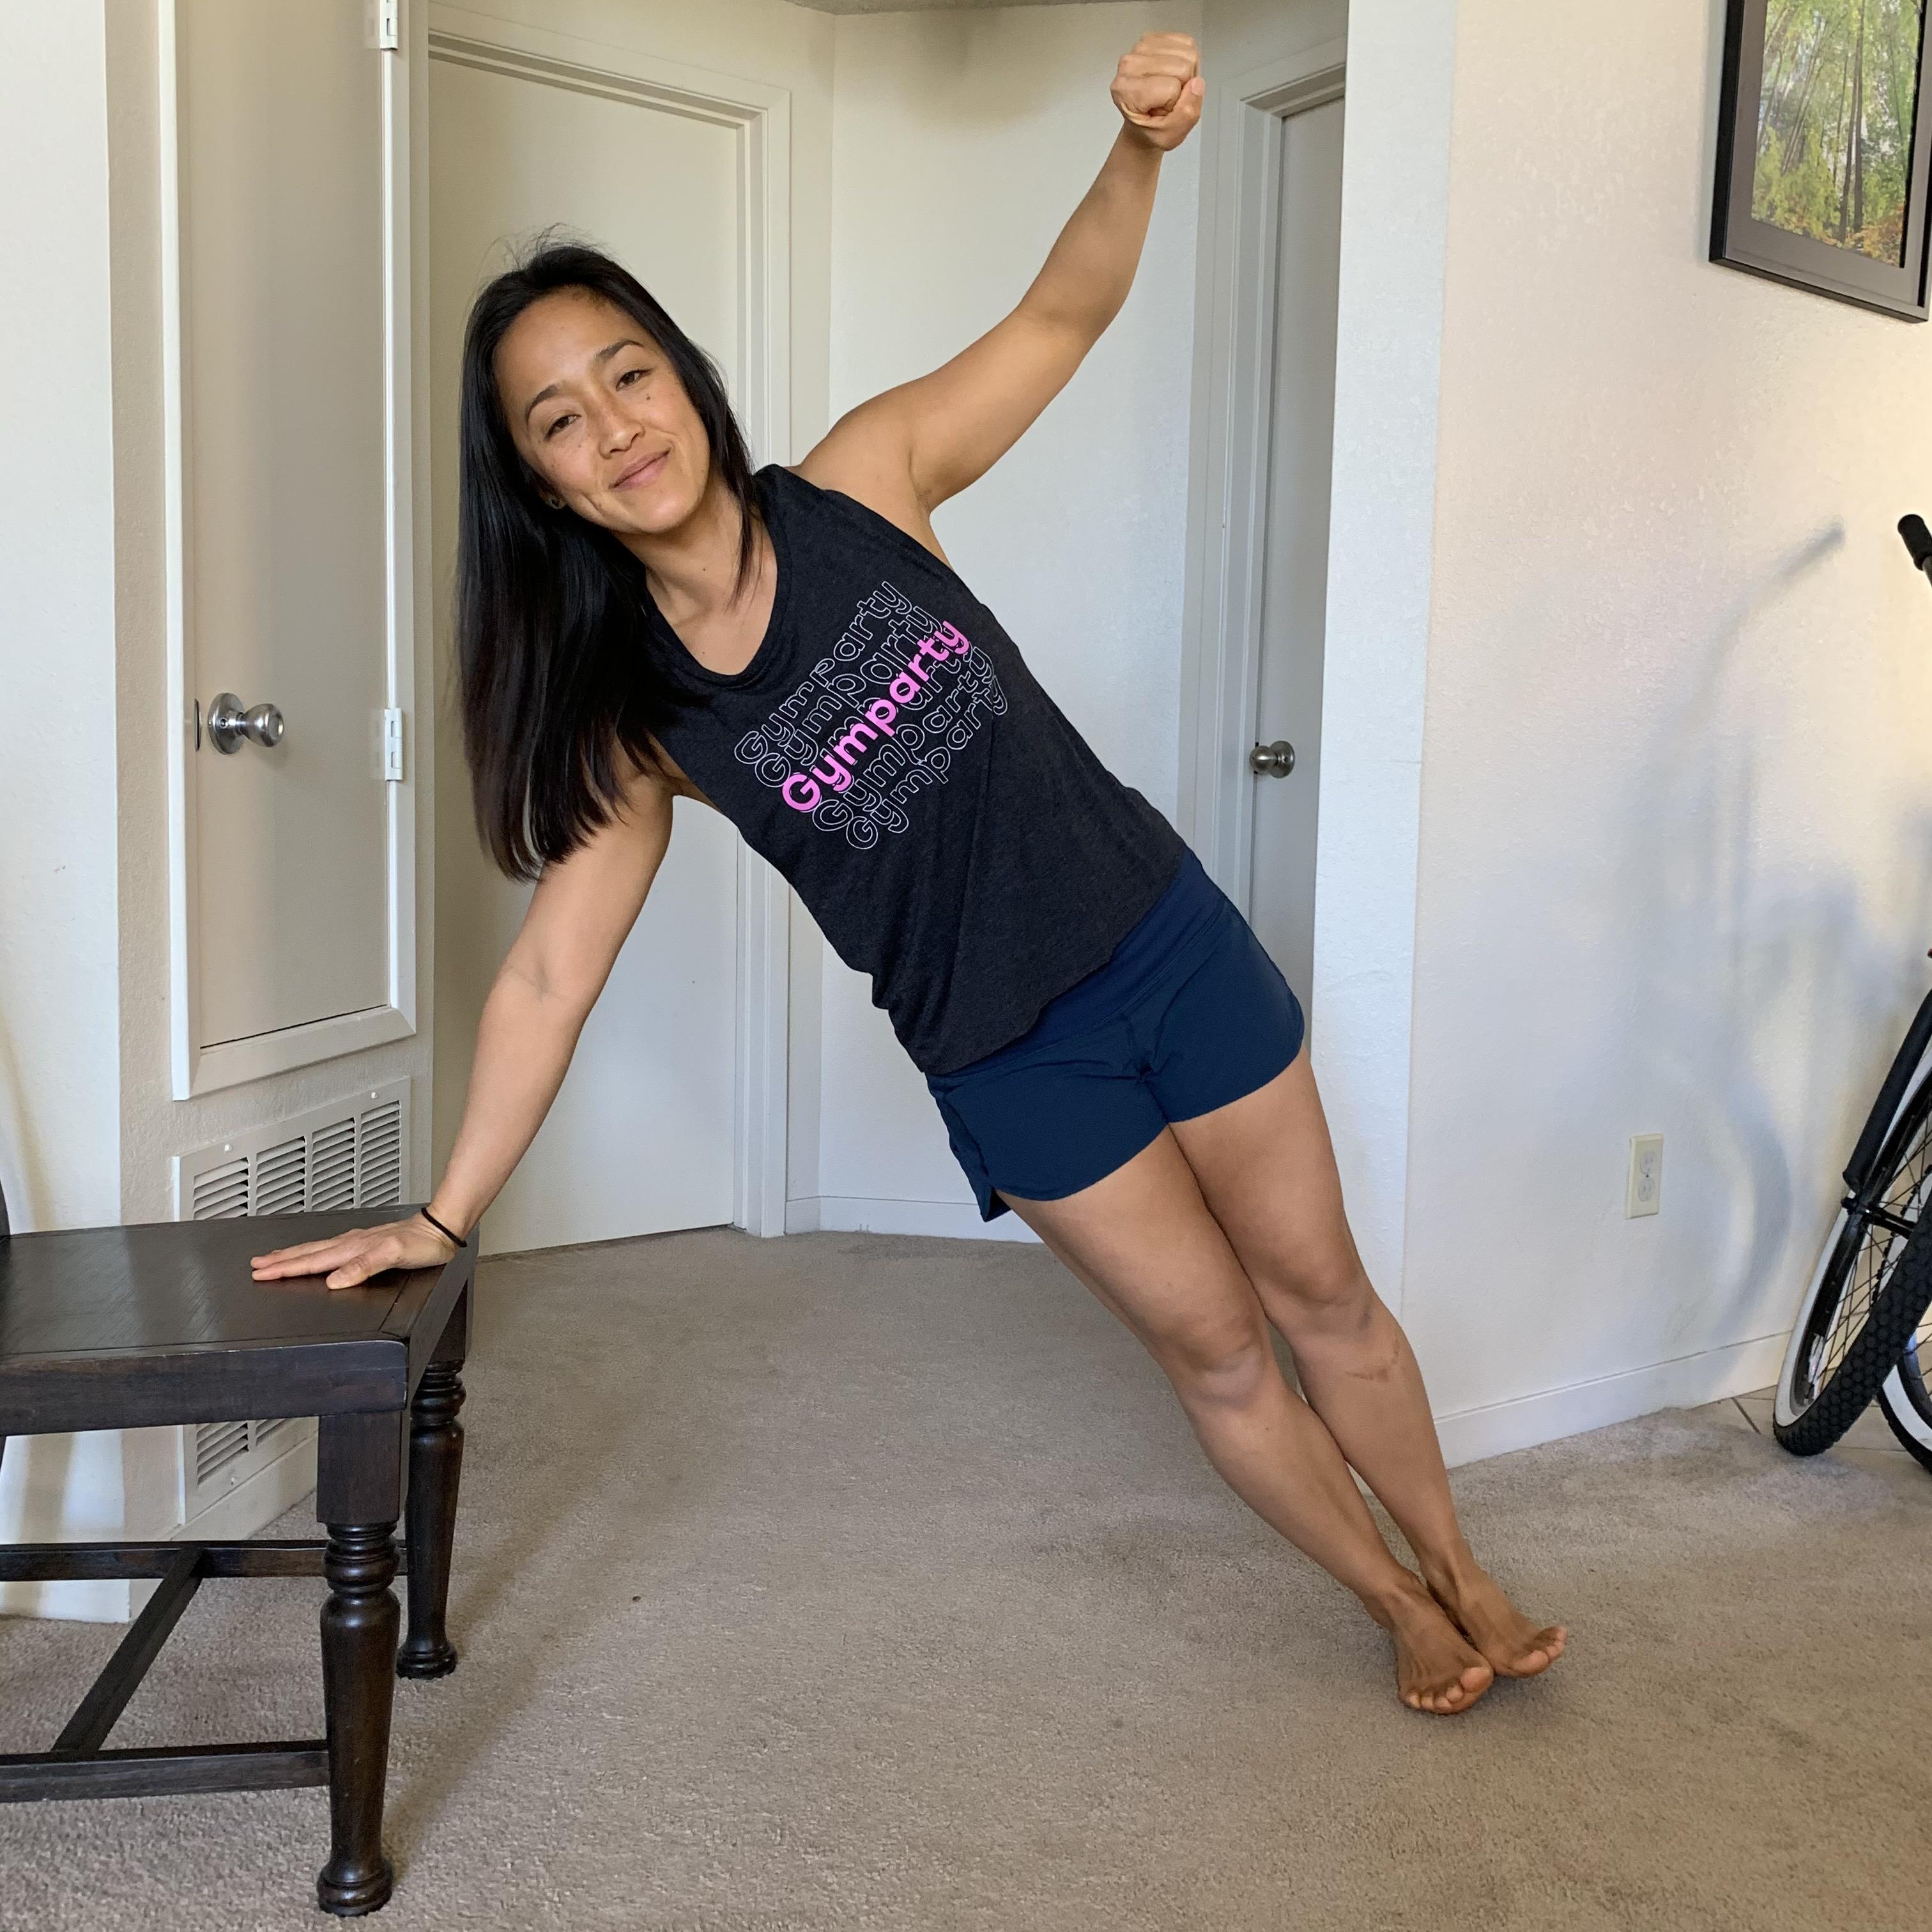 Elevated Side Planks